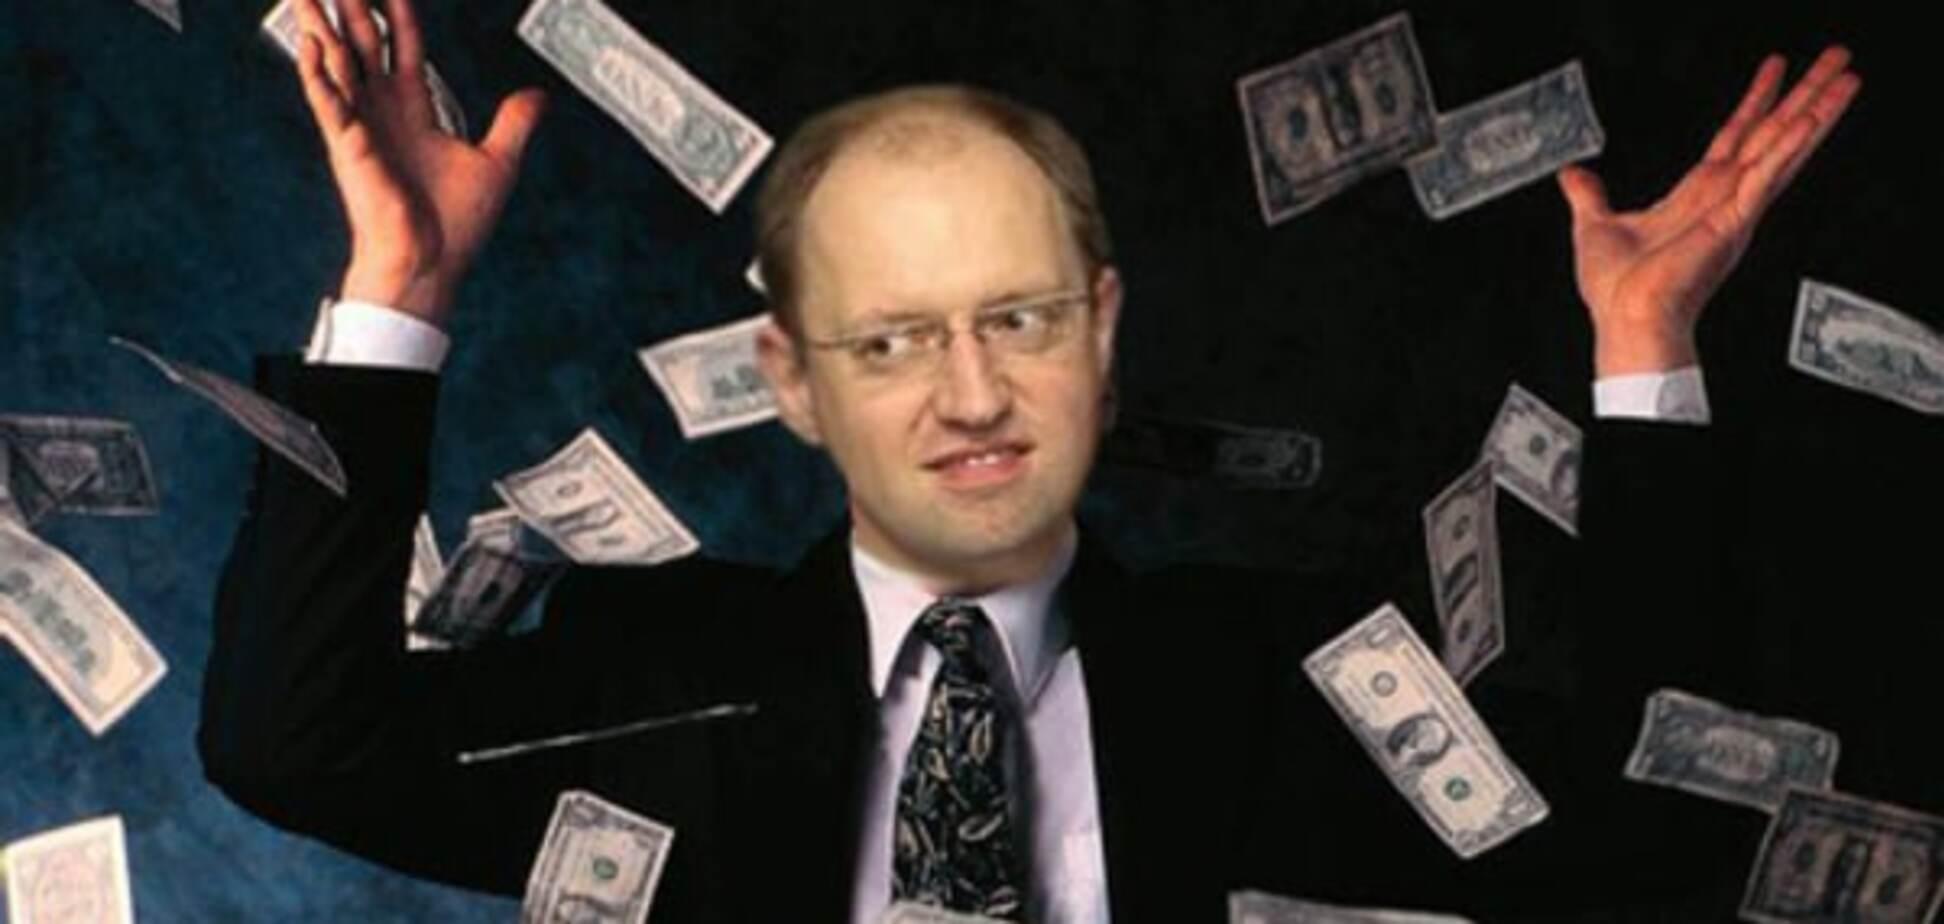 $3 млн за посаду: ГПУ зобов'язали відкрити справу проти Яценюка-хабарника - нардеп